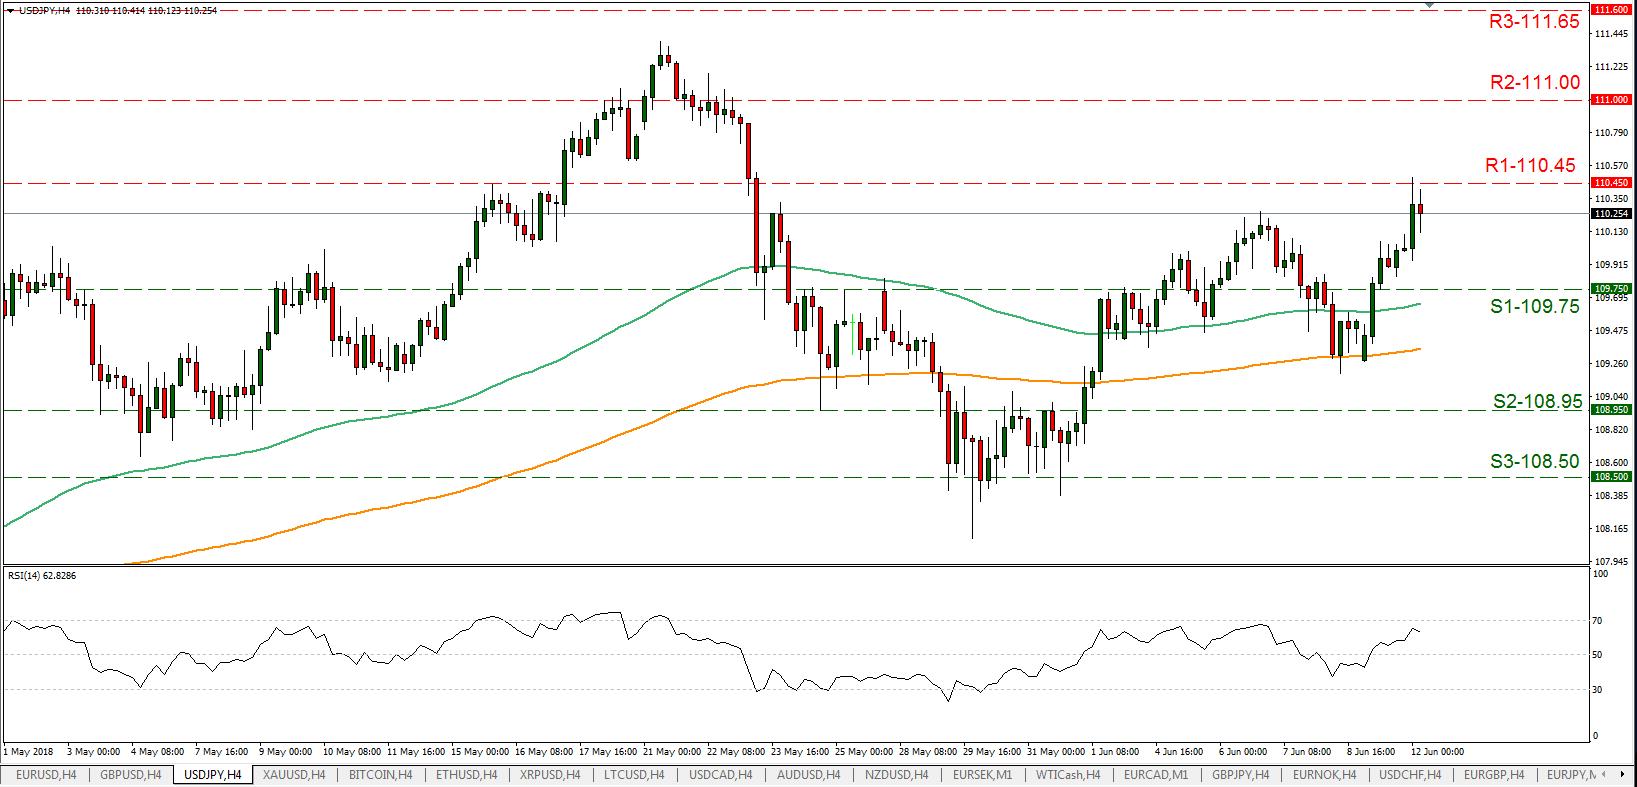 USD/JPY 12/06/2018 | EconAlerts